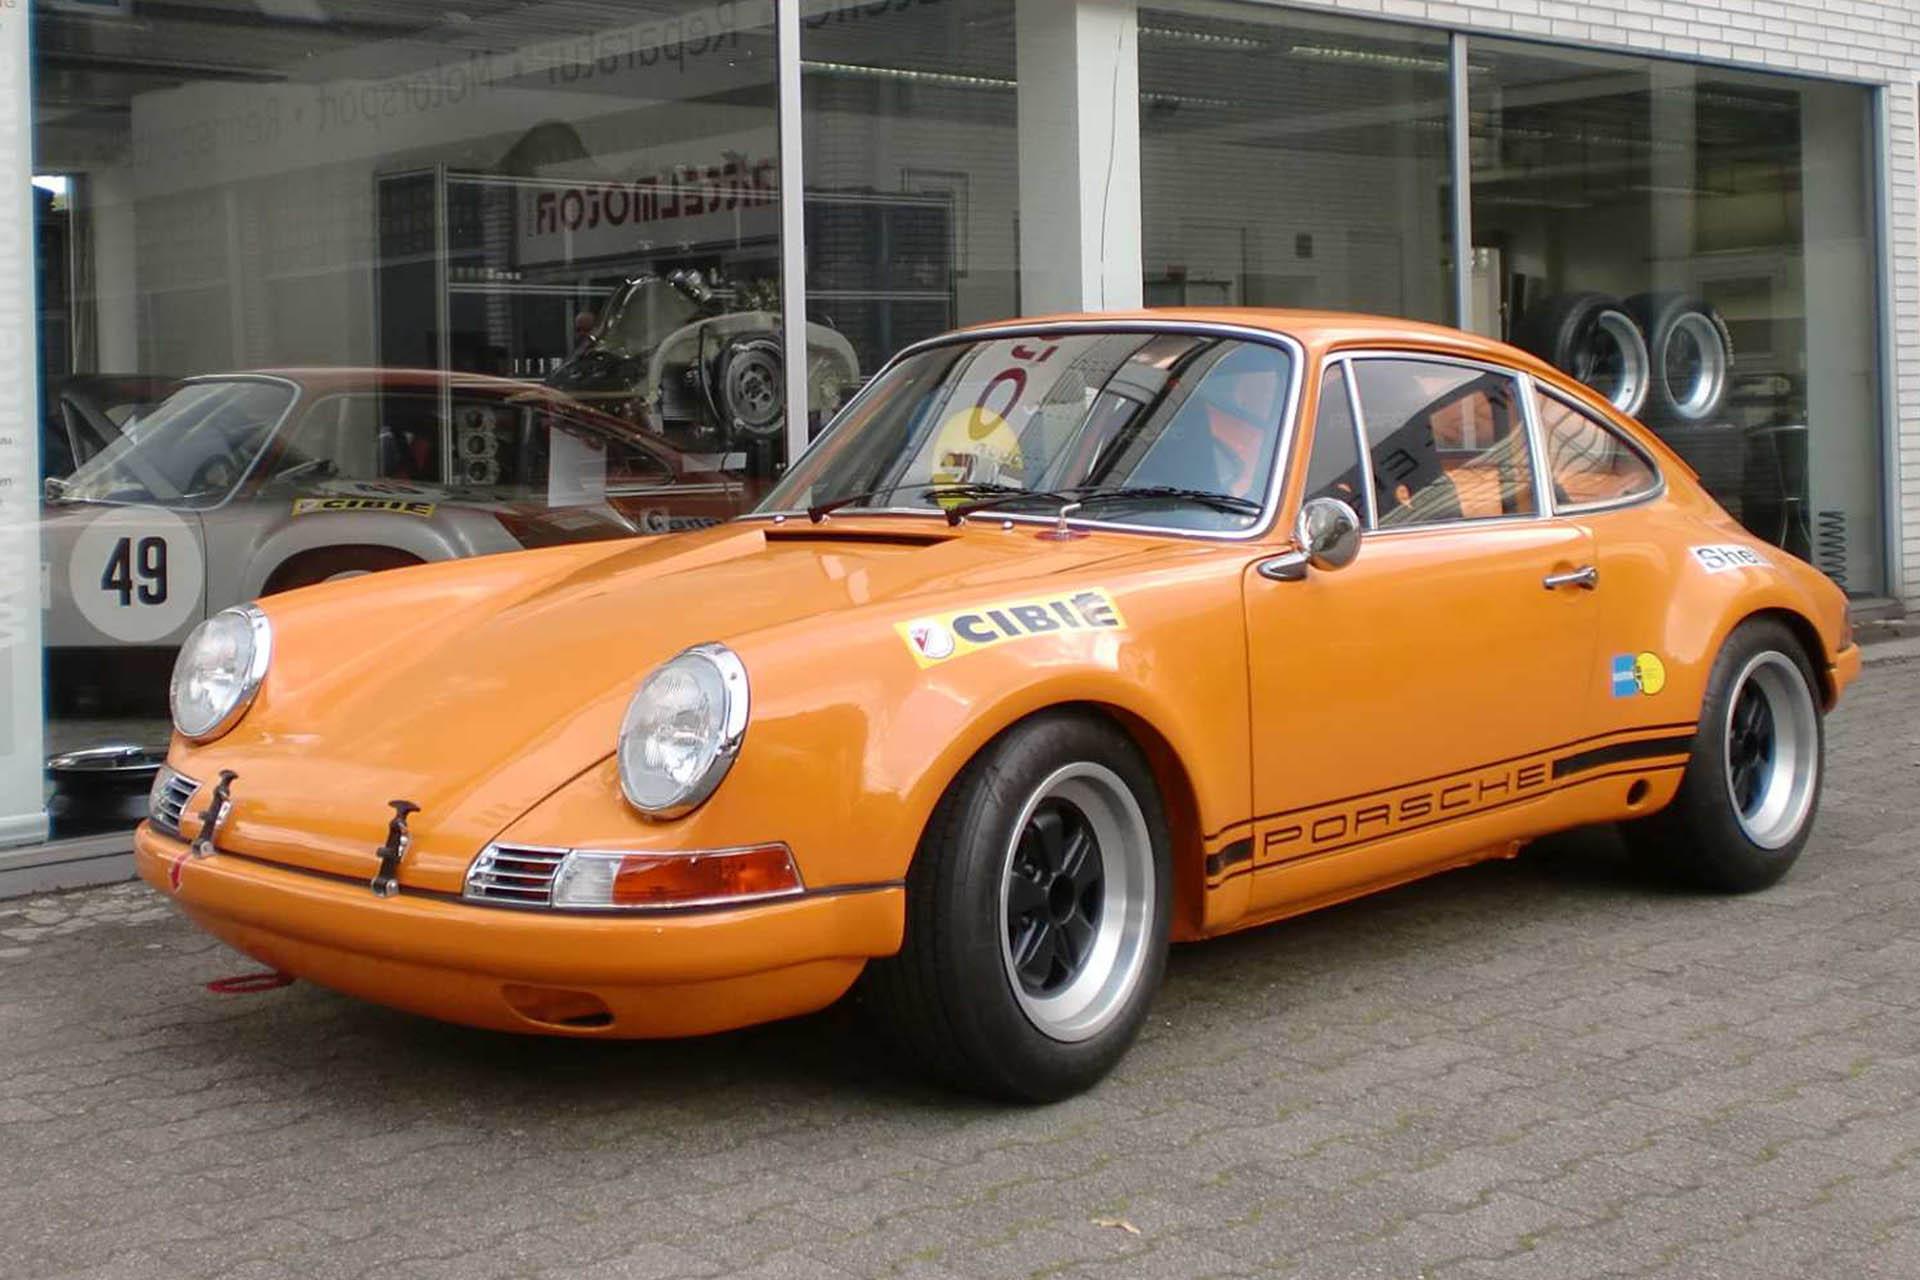 911 ST 2,3 (2,5) '70